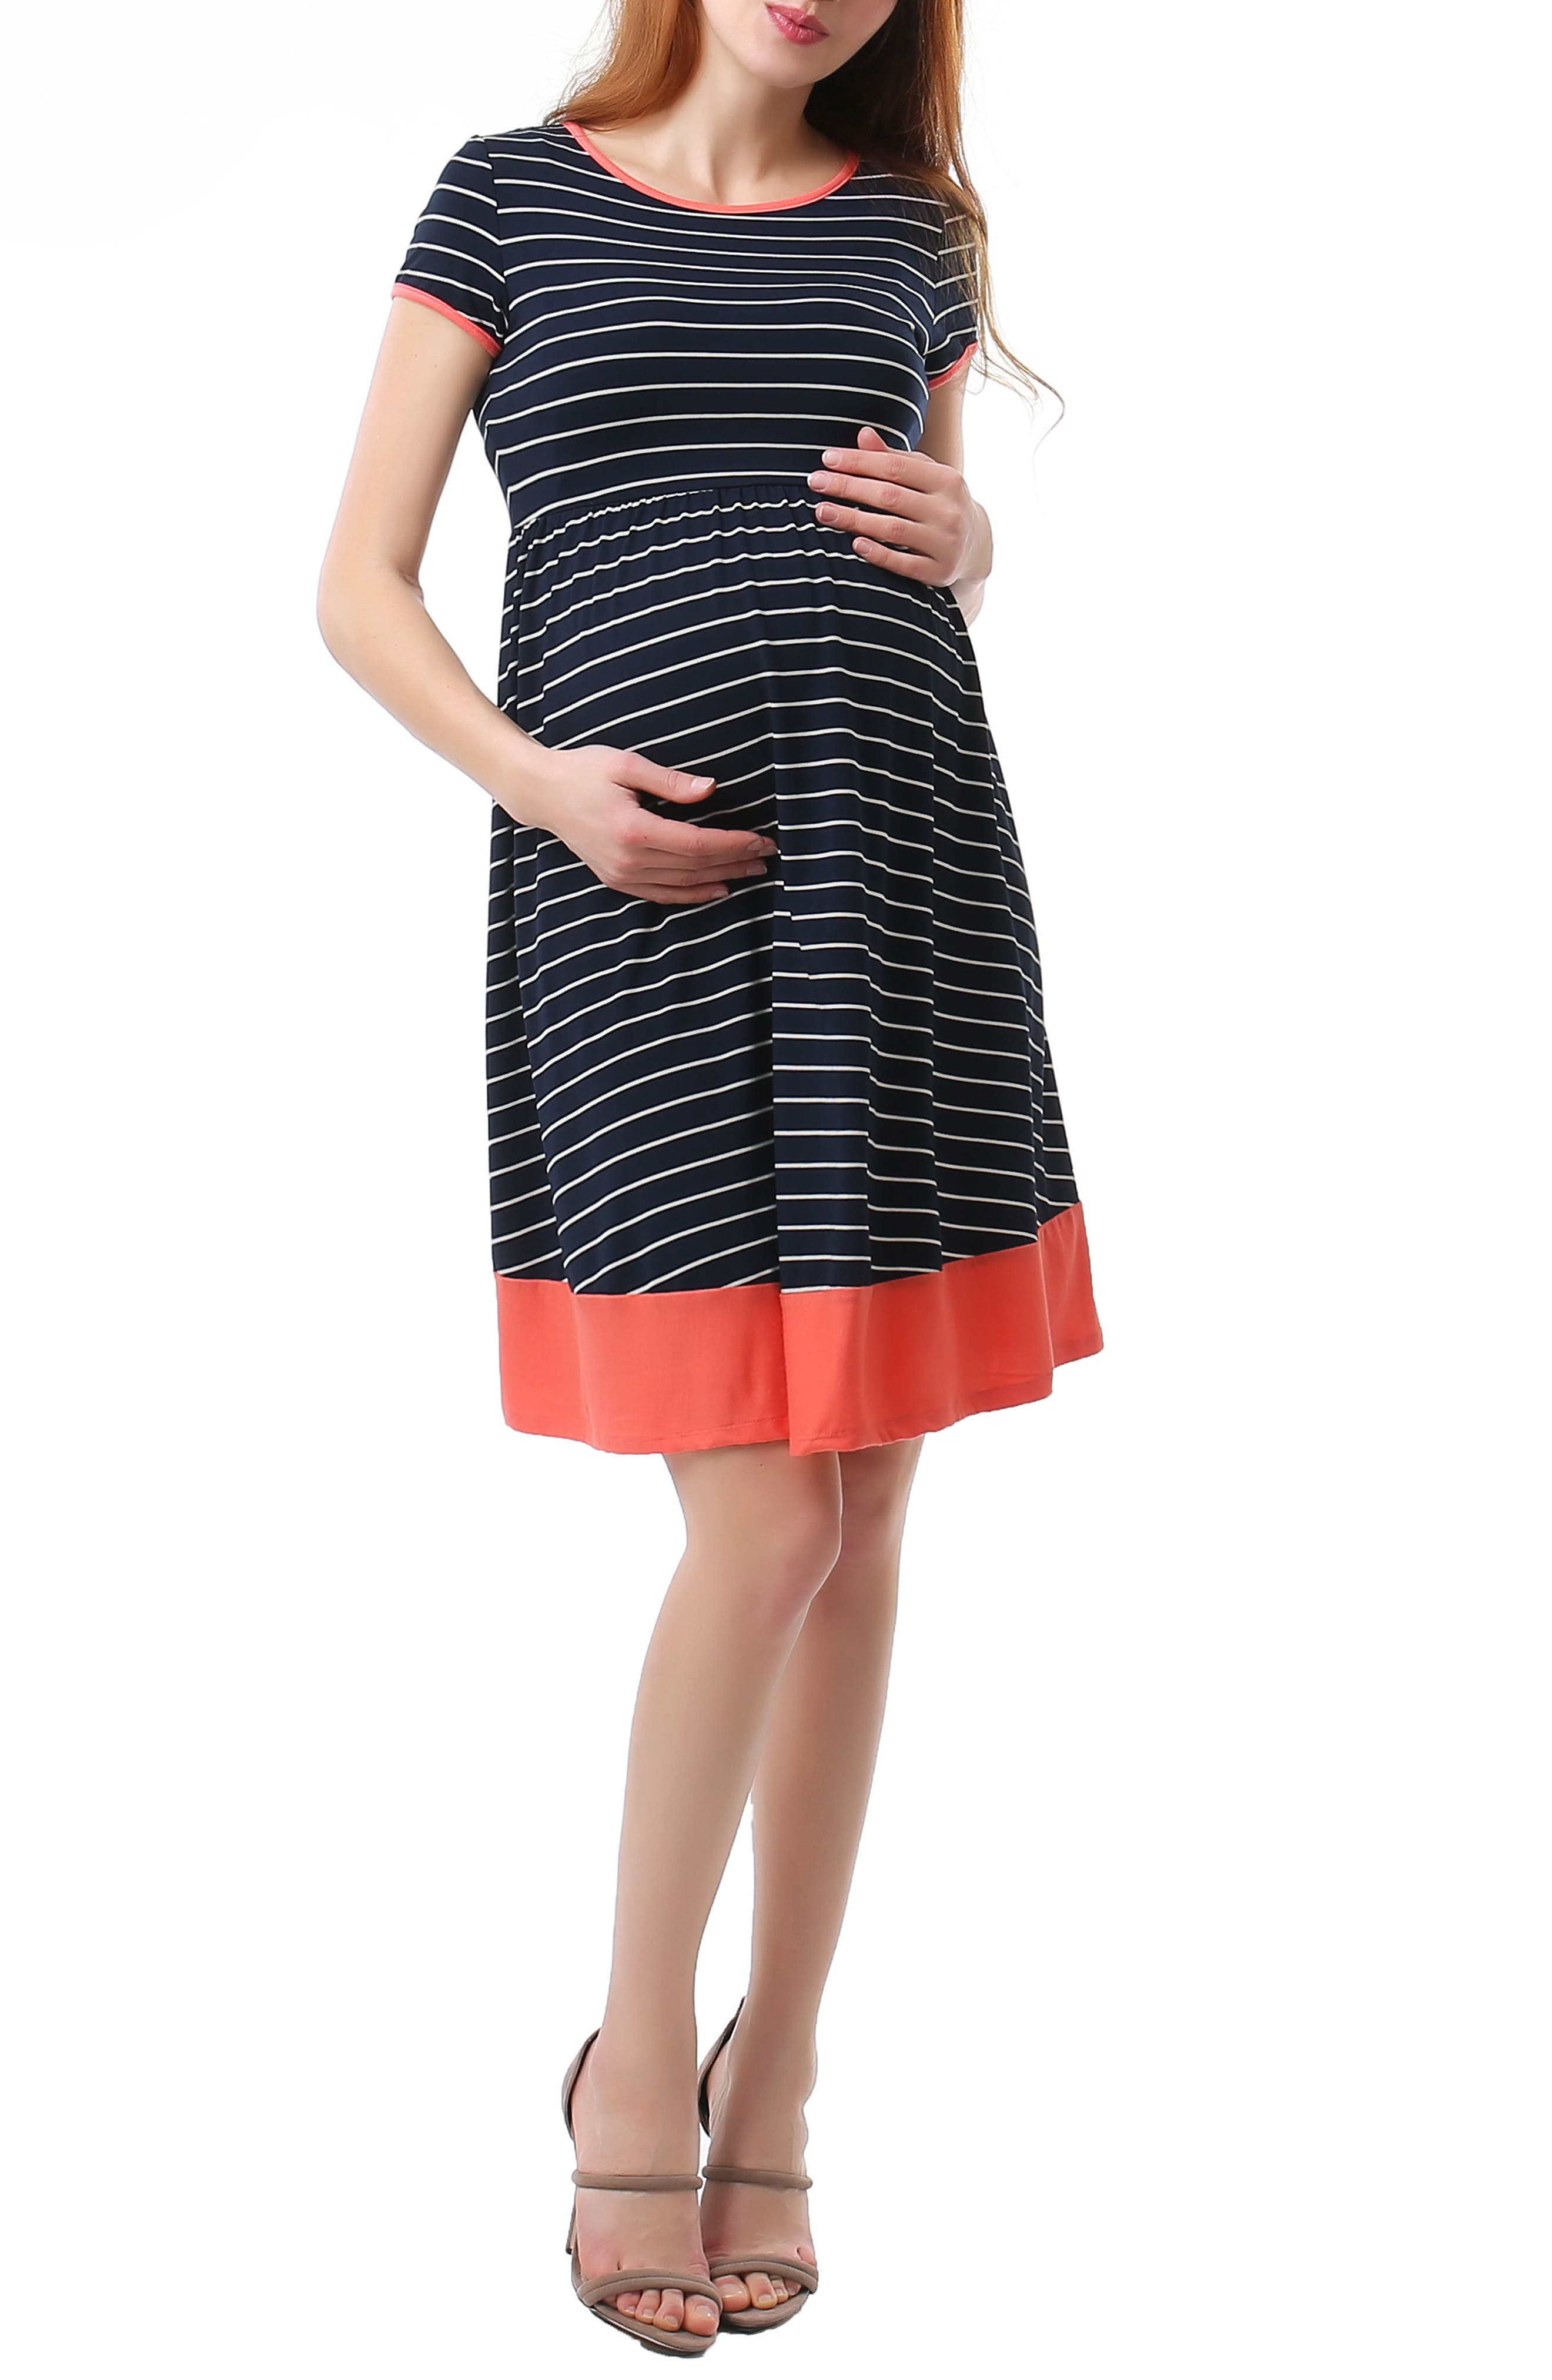 Kira Stripe Maternity Skater Dress,                         Main,                         color, Navy/ Ivory